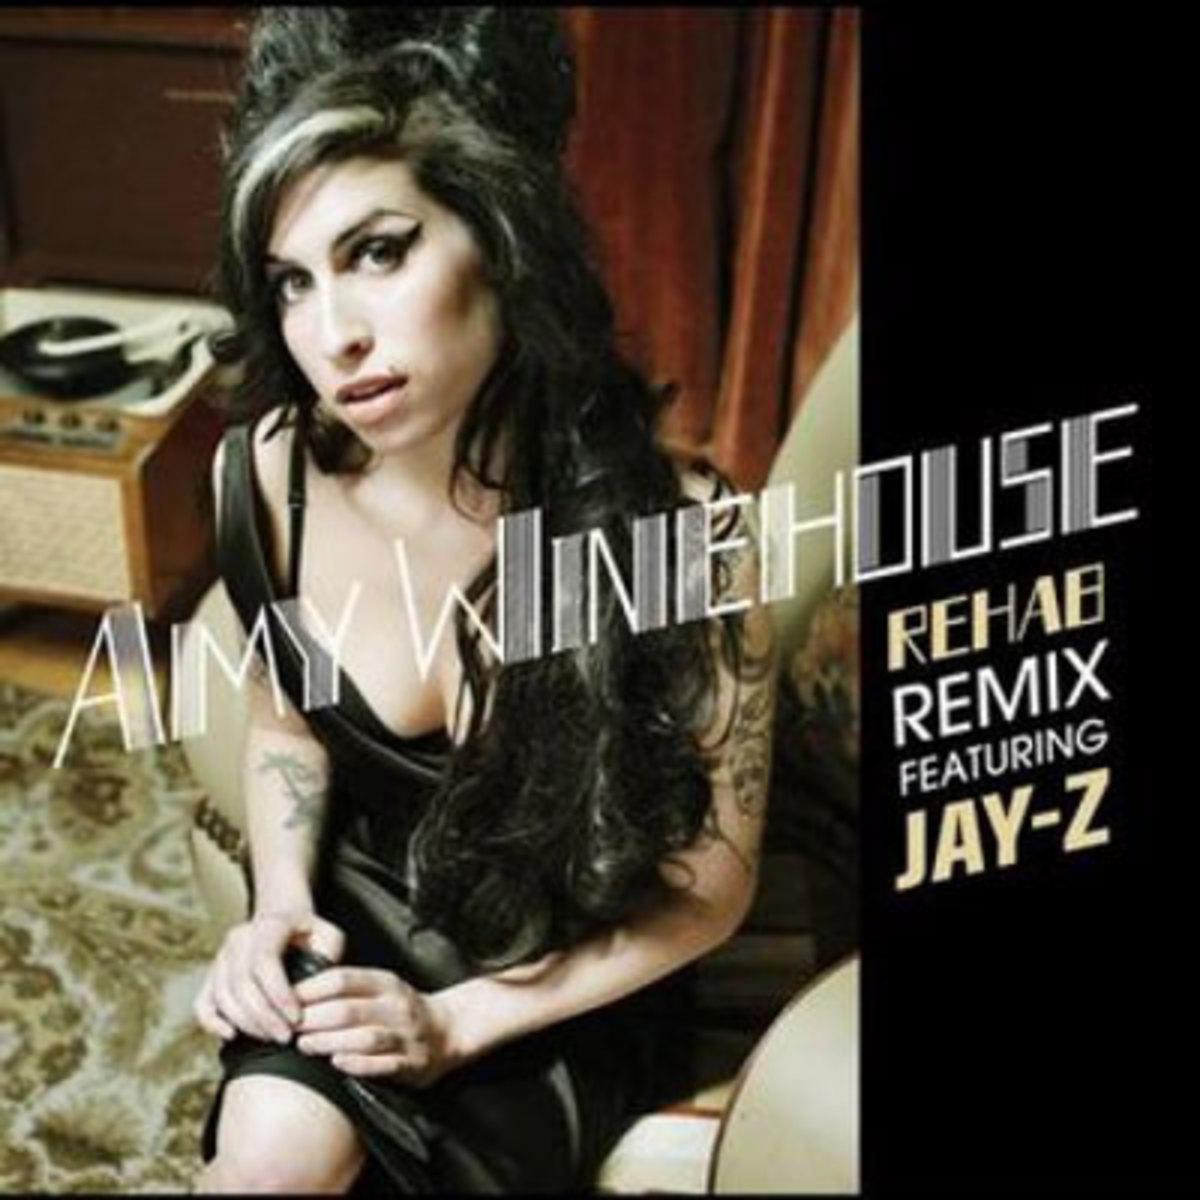 awinehouse-rehabrmx.jpg